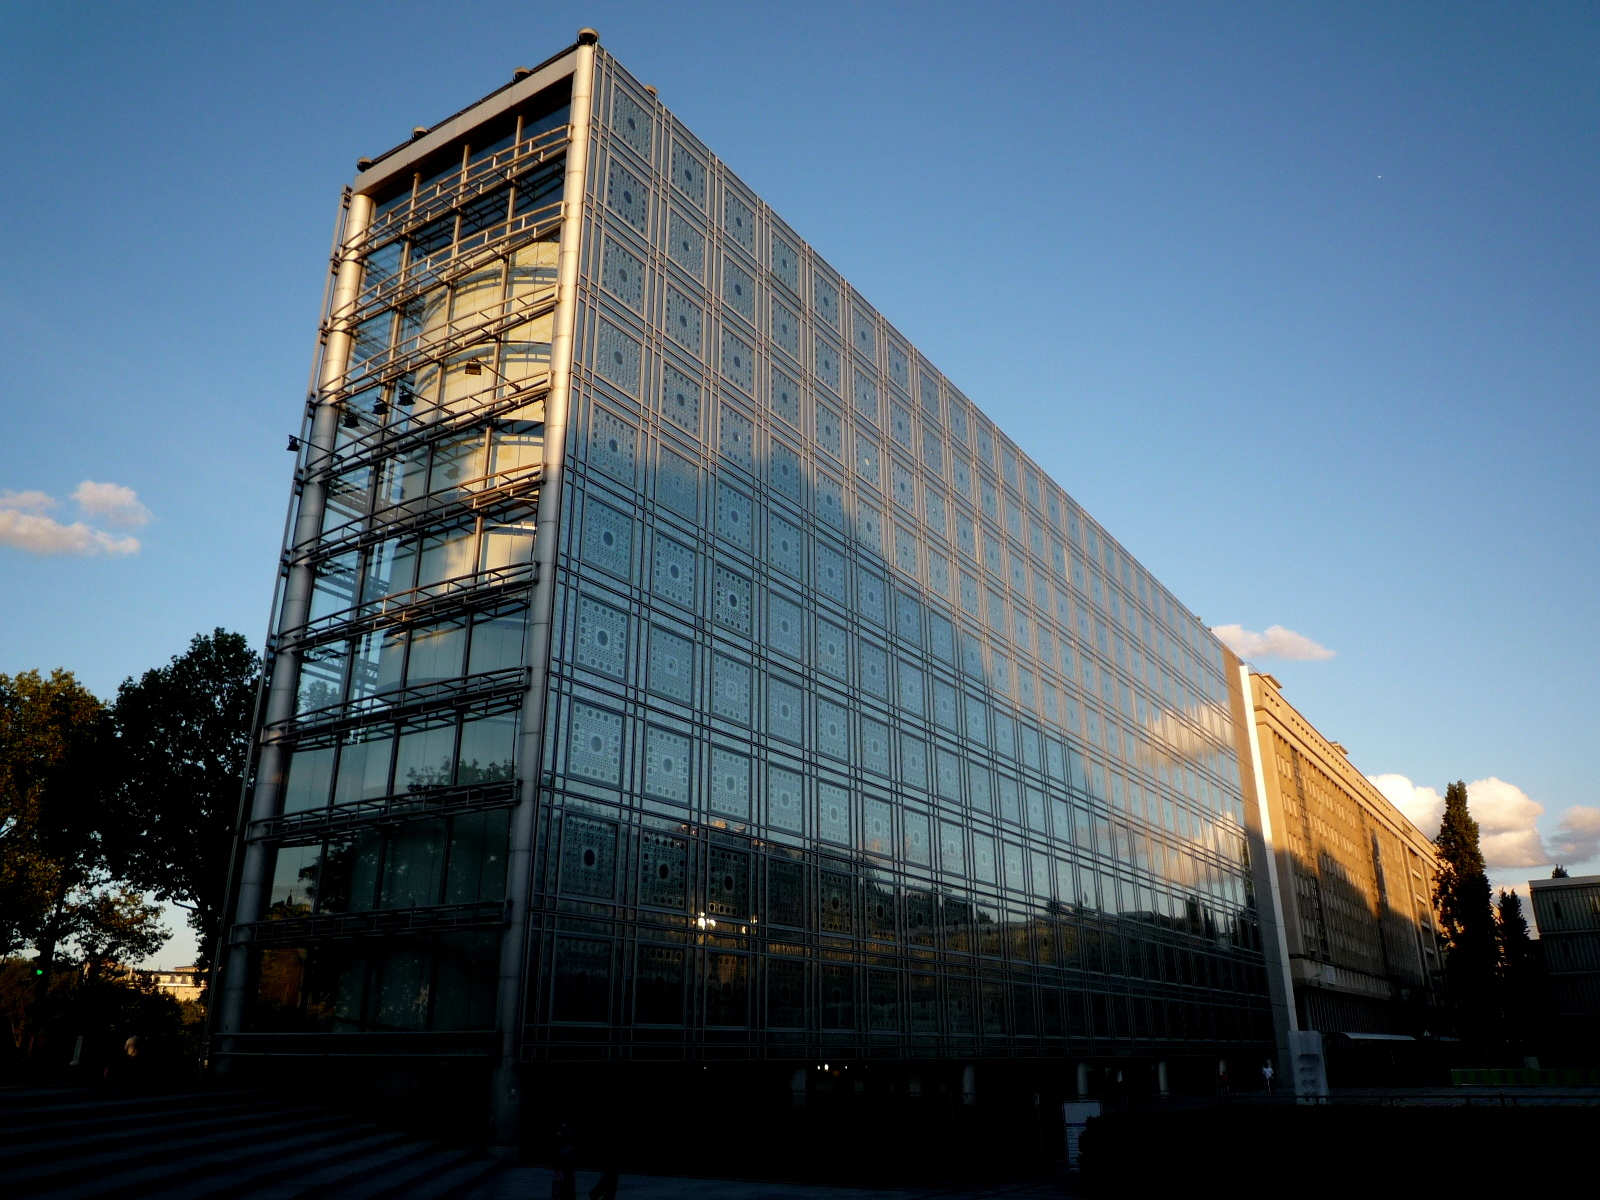 Arab institute paris urban architecture now for Architecture jean nouvel